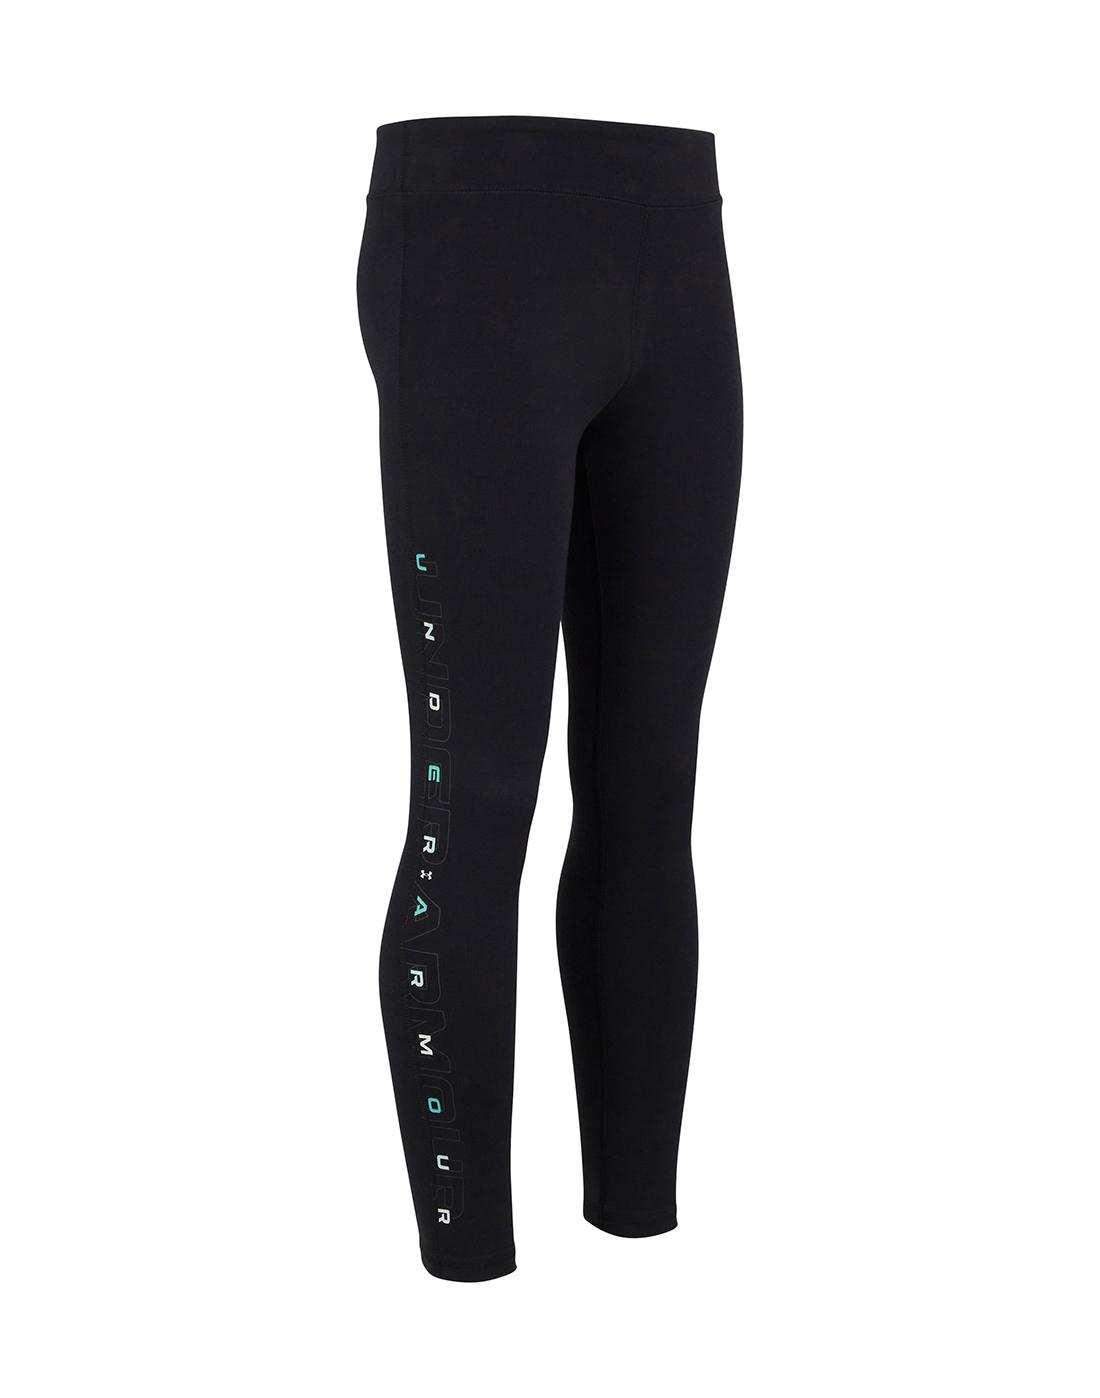 under-armour-girls-legging-black-mint